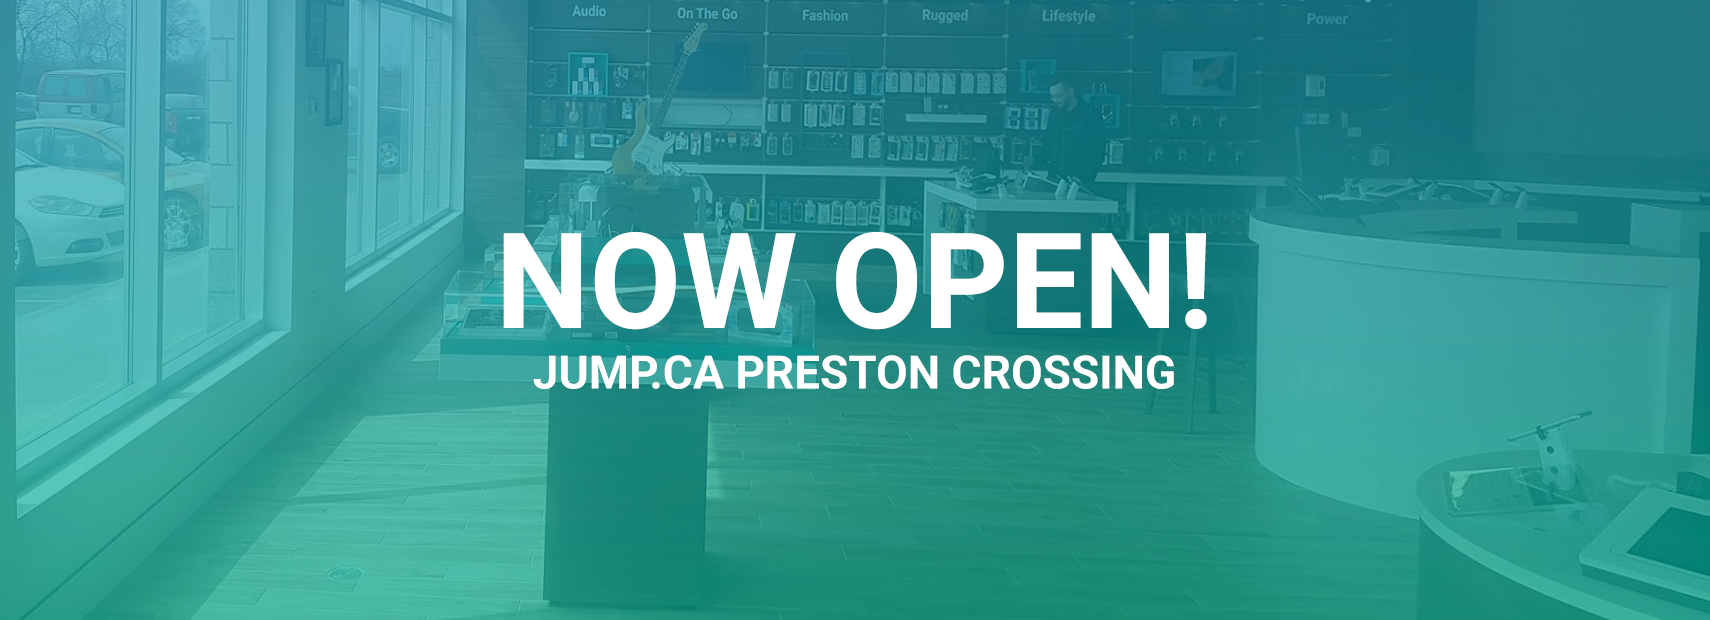 Jump.ca Preston Crossing Now Open